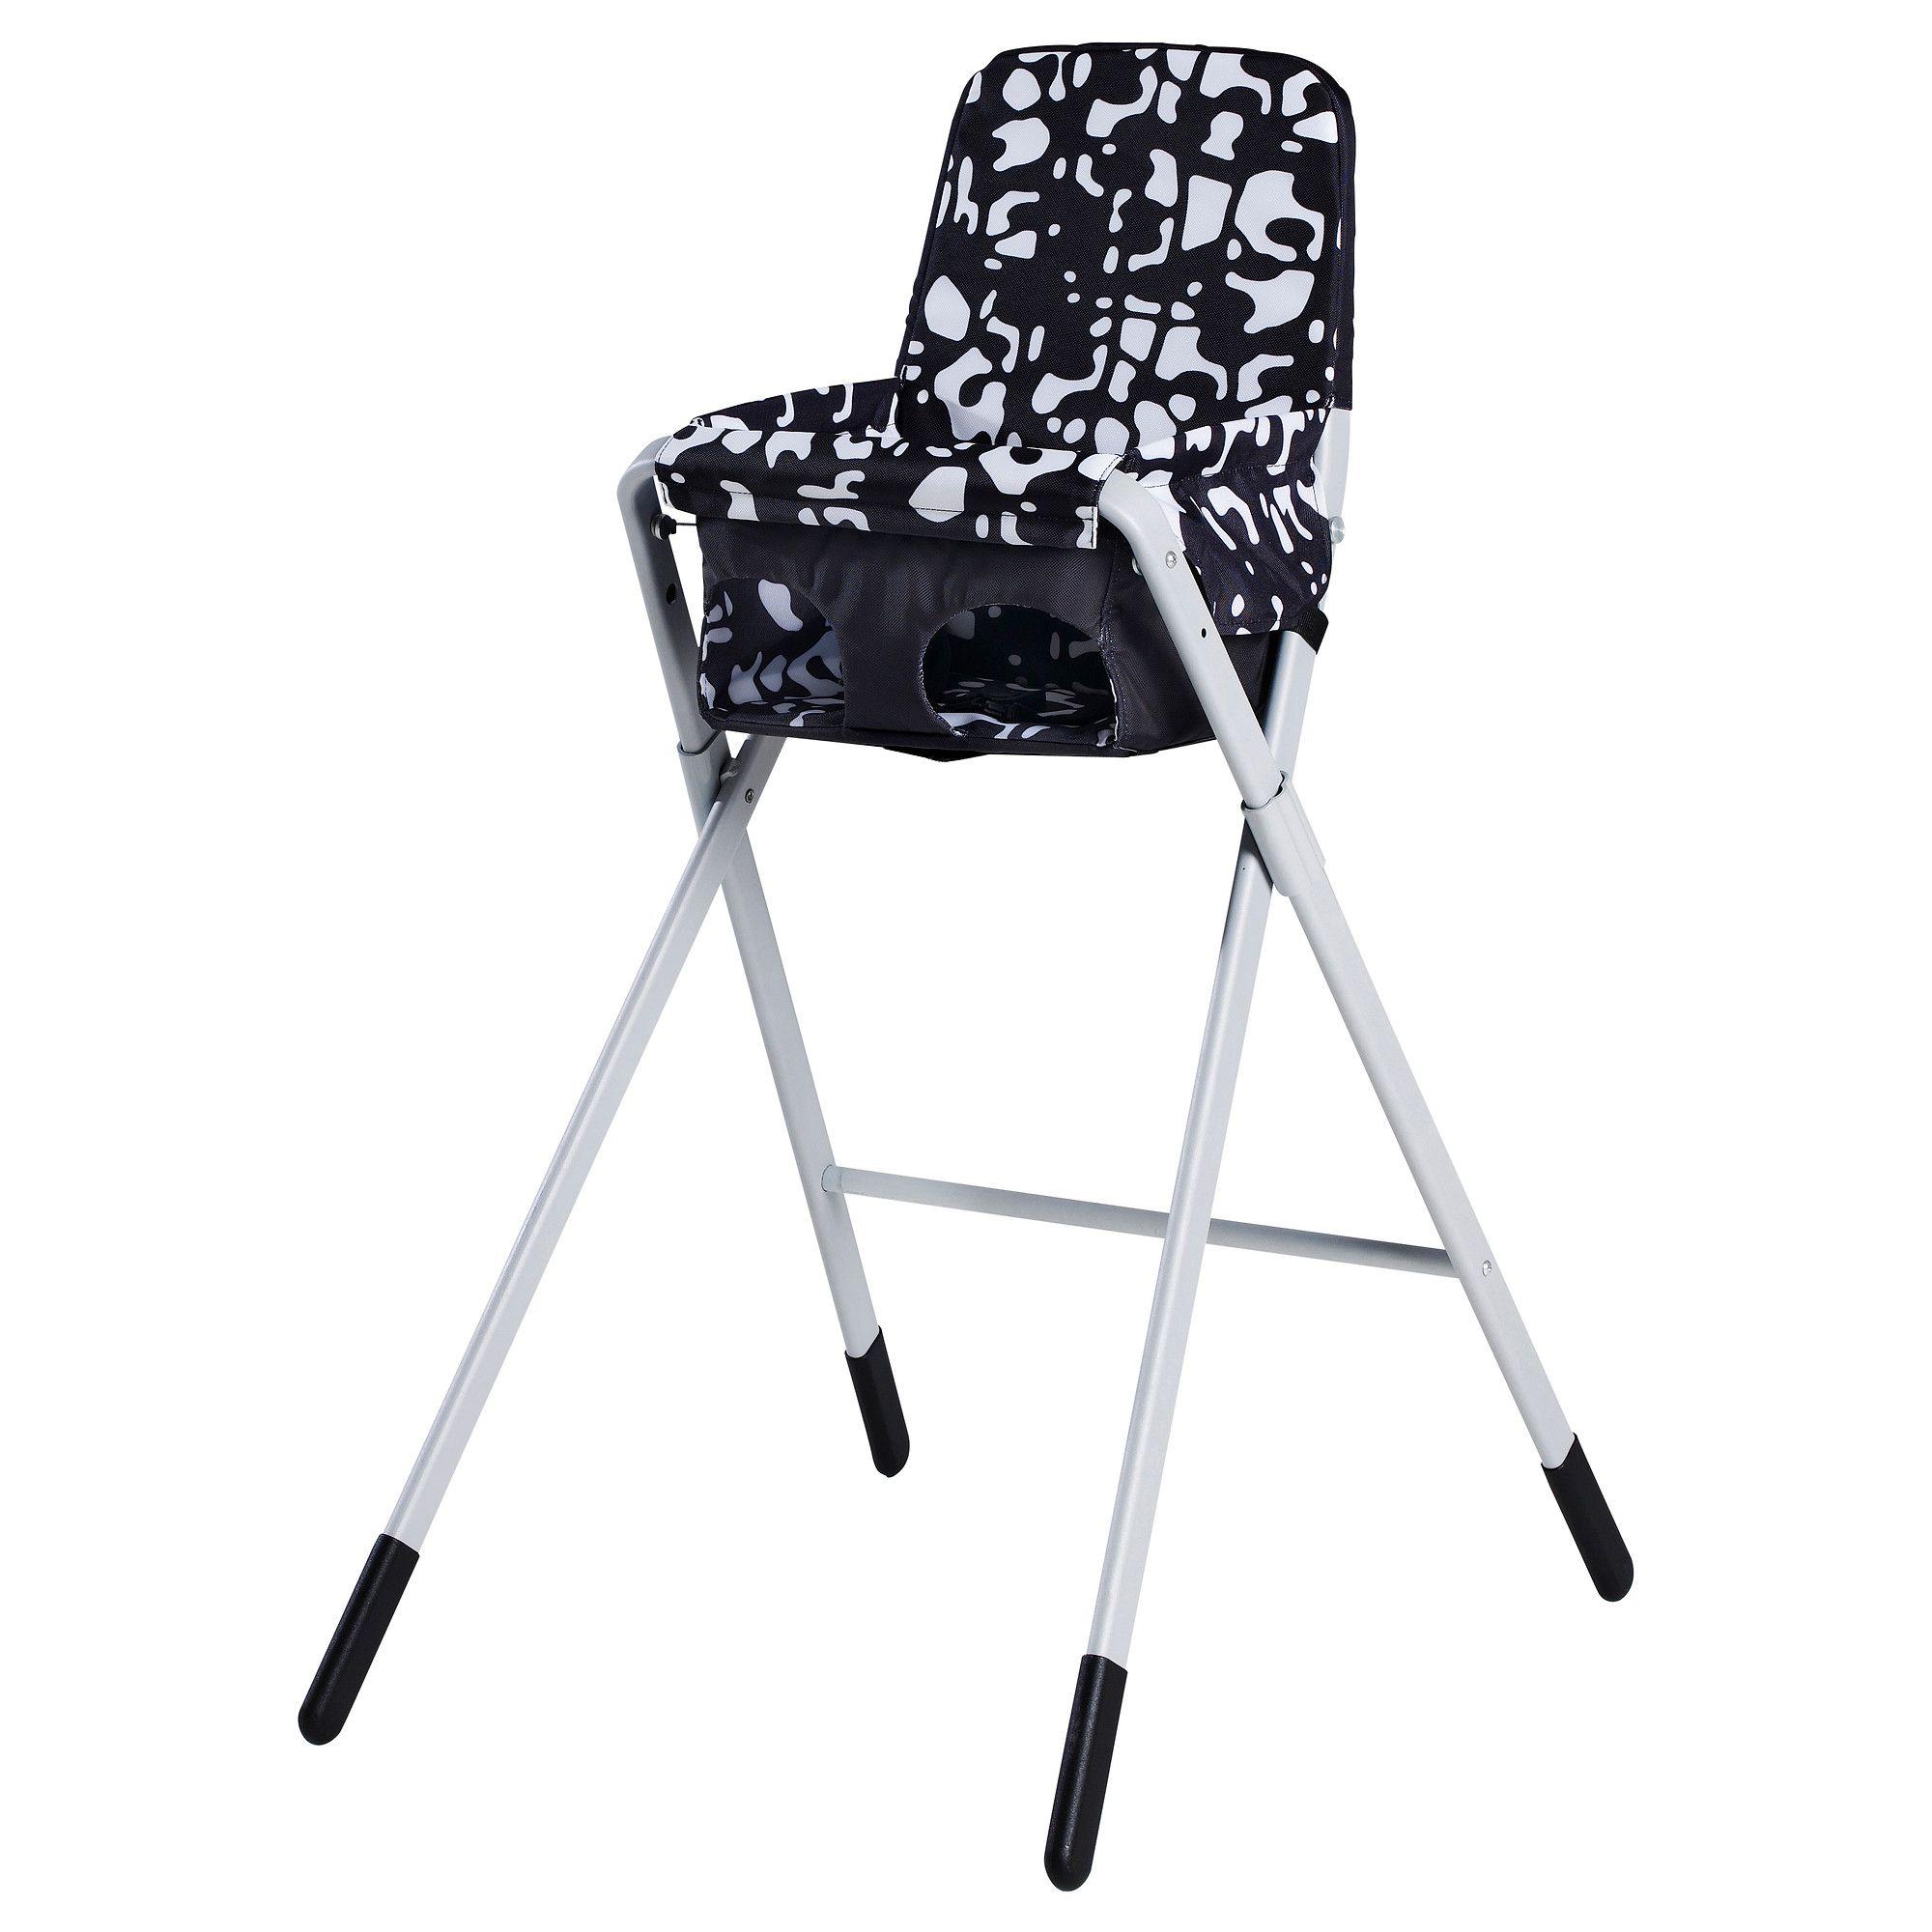 Ikea Us Furniture And Home Furnishings Ikea Baby Baby High Chair High Chair